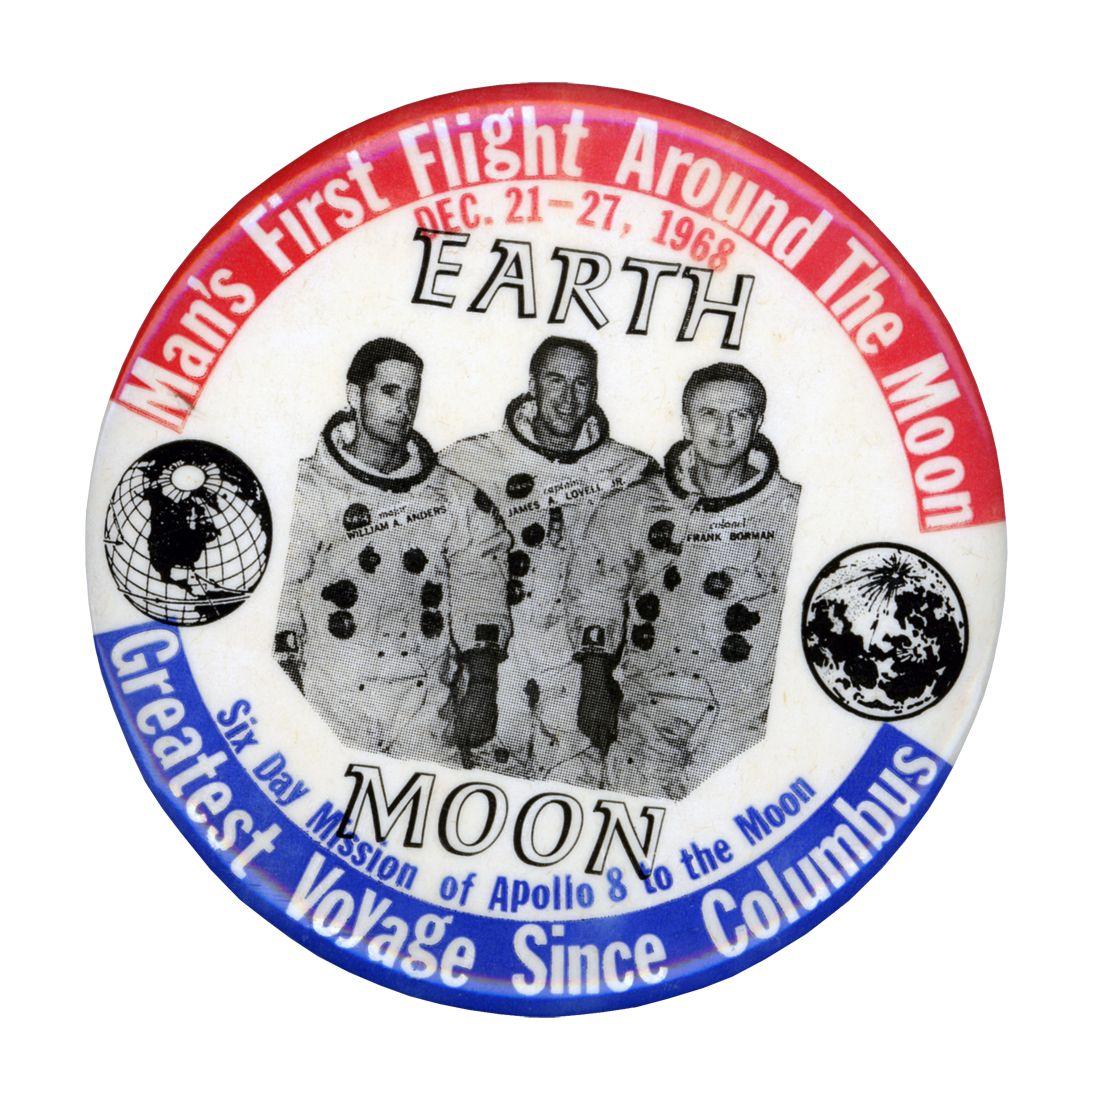 Johnson Space Center Button, vintage 1968